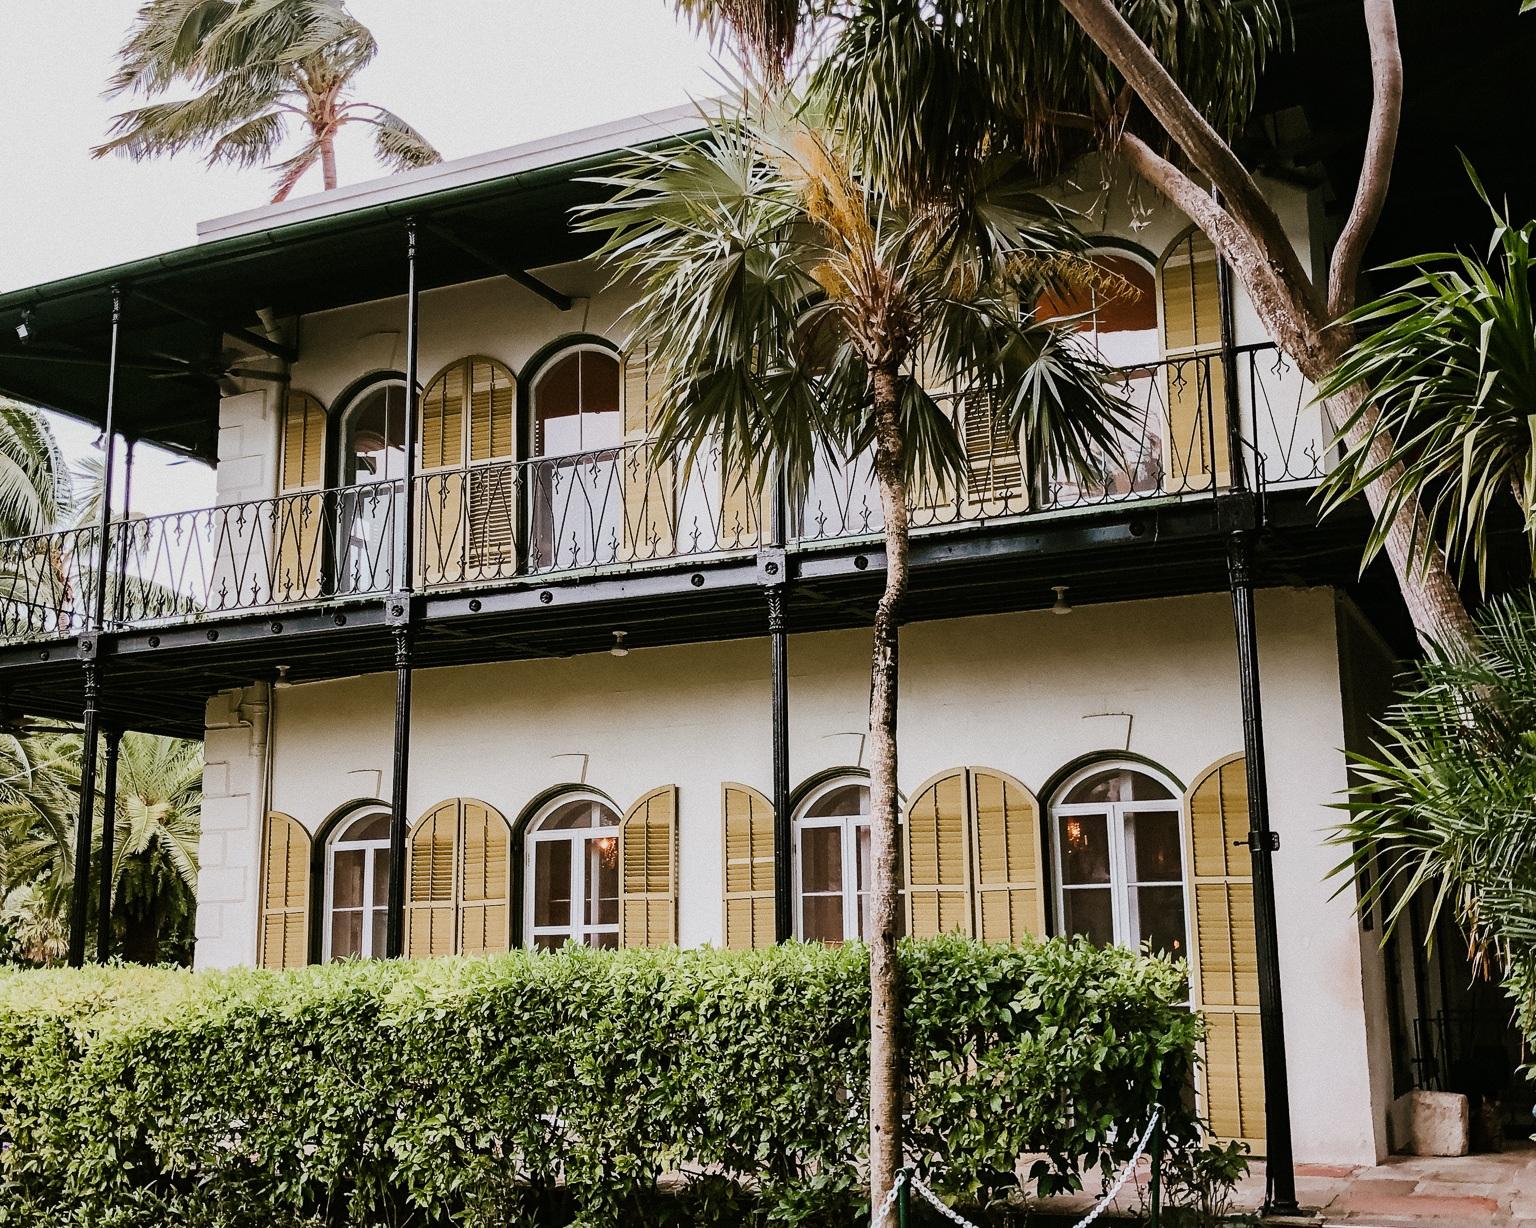 Key West Honeymoon - Hemingway House